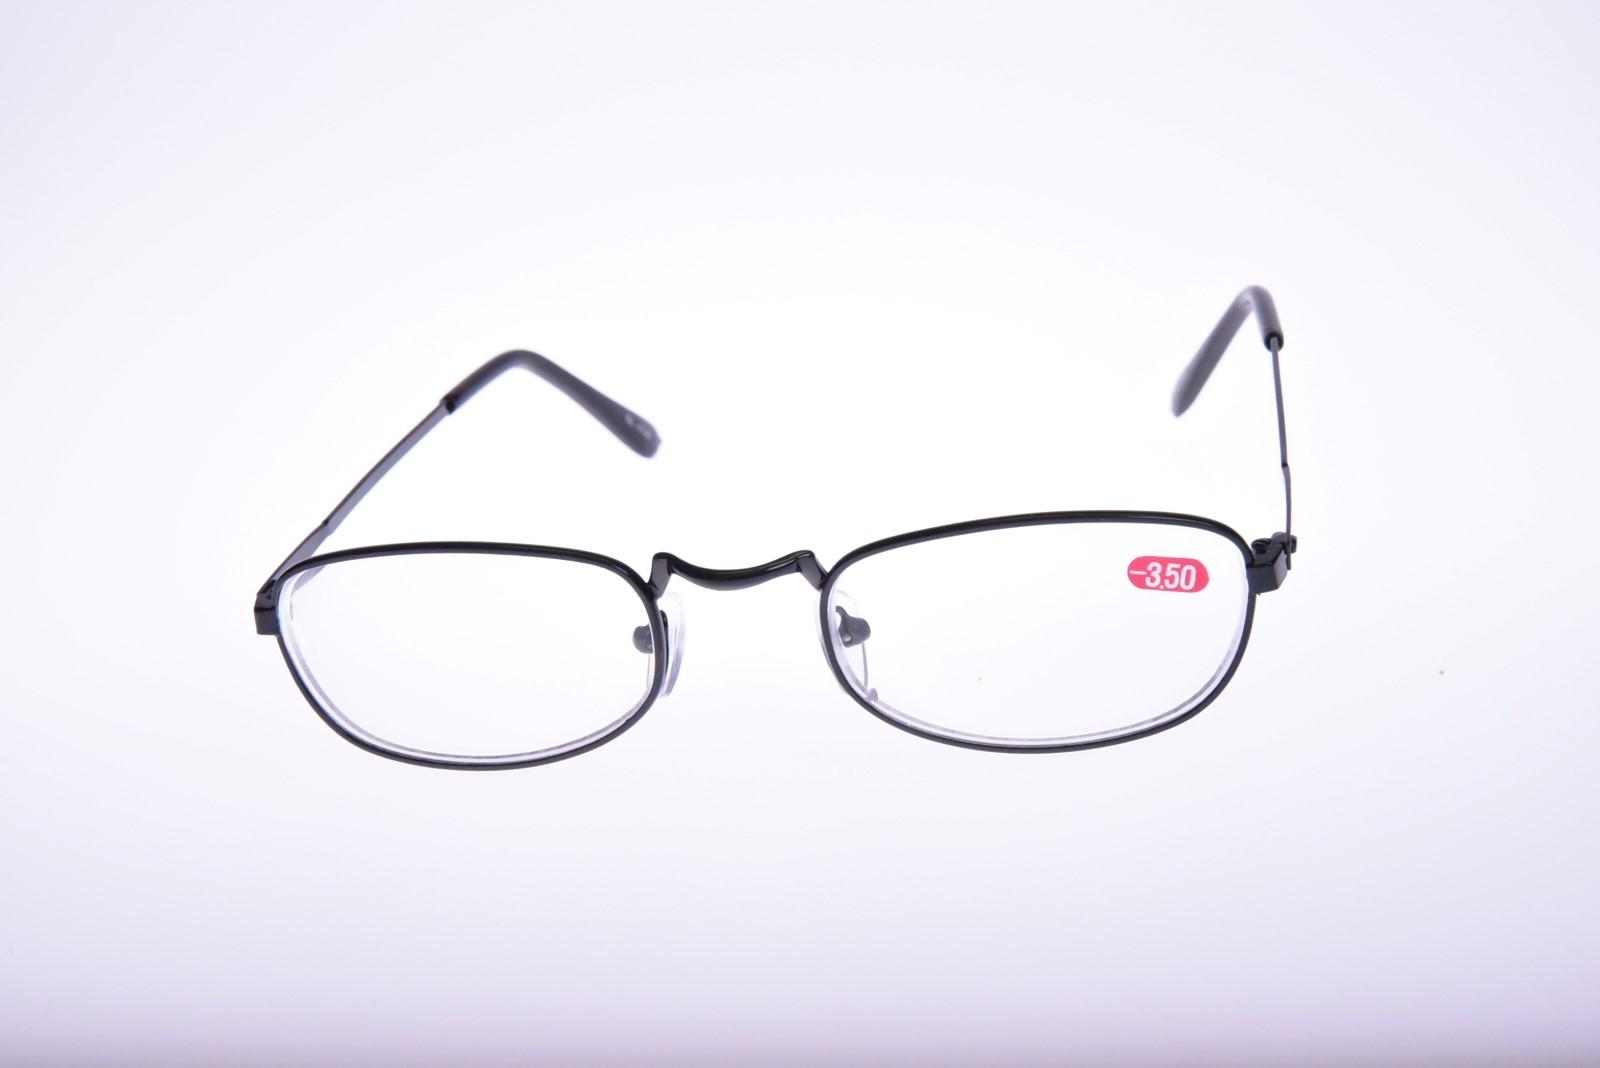 Dioptrické okuliare 2030 - Unisex - mínus